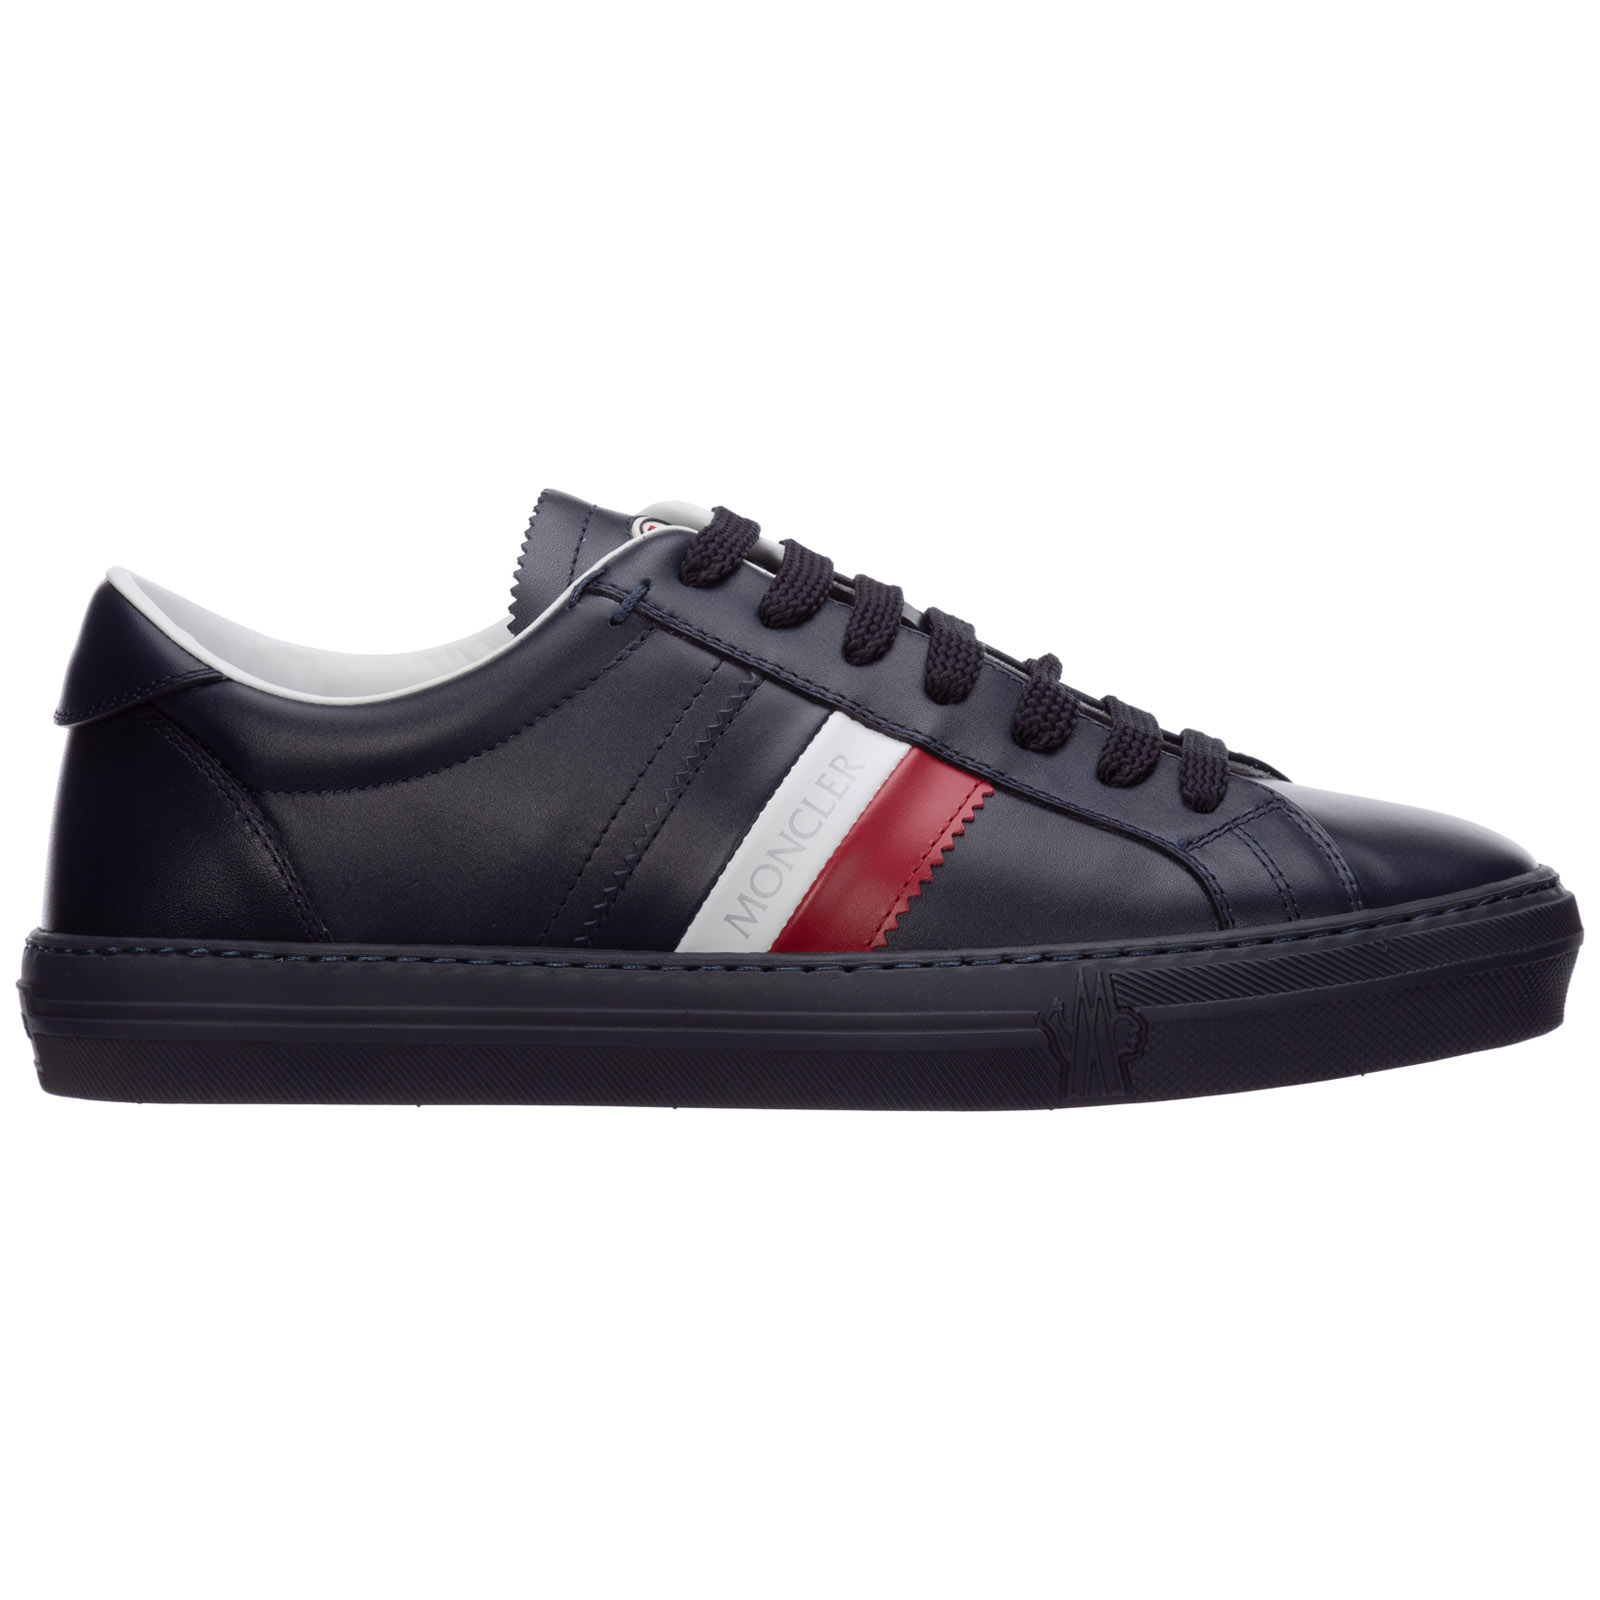 Sneakers Moncler la monaco